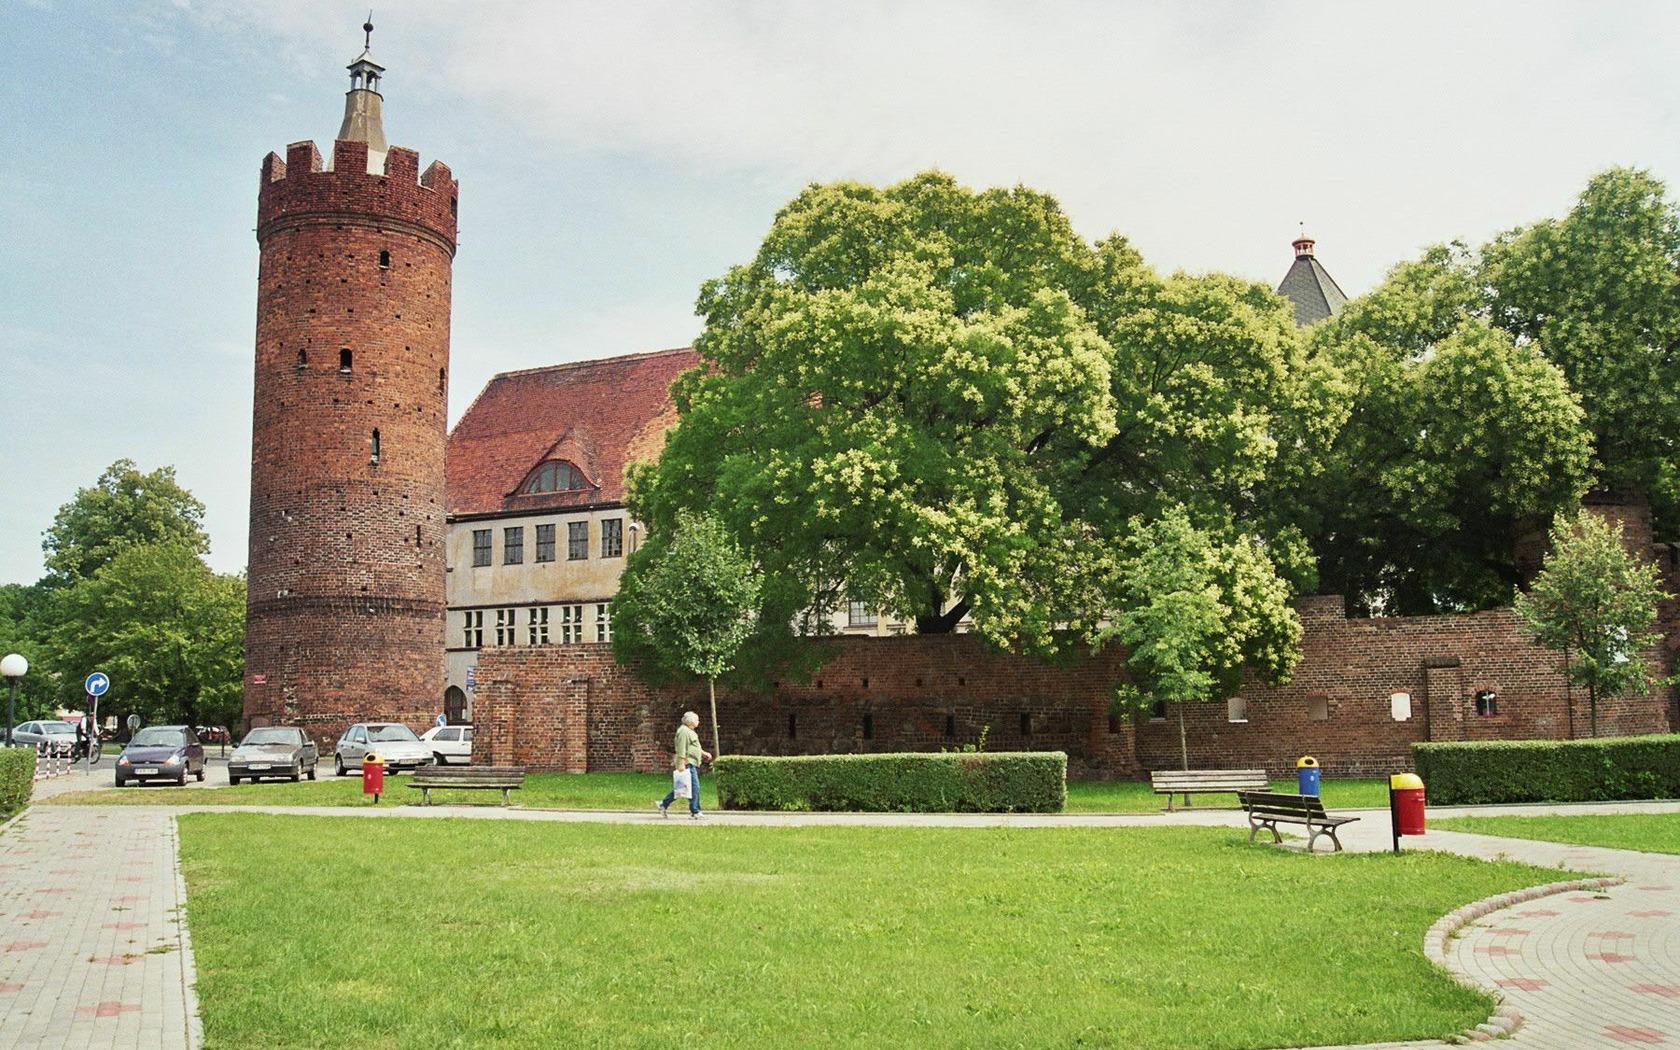 Dicker Turm Museumskammer, Foto: Marketing und Tourismus Guben e.V.